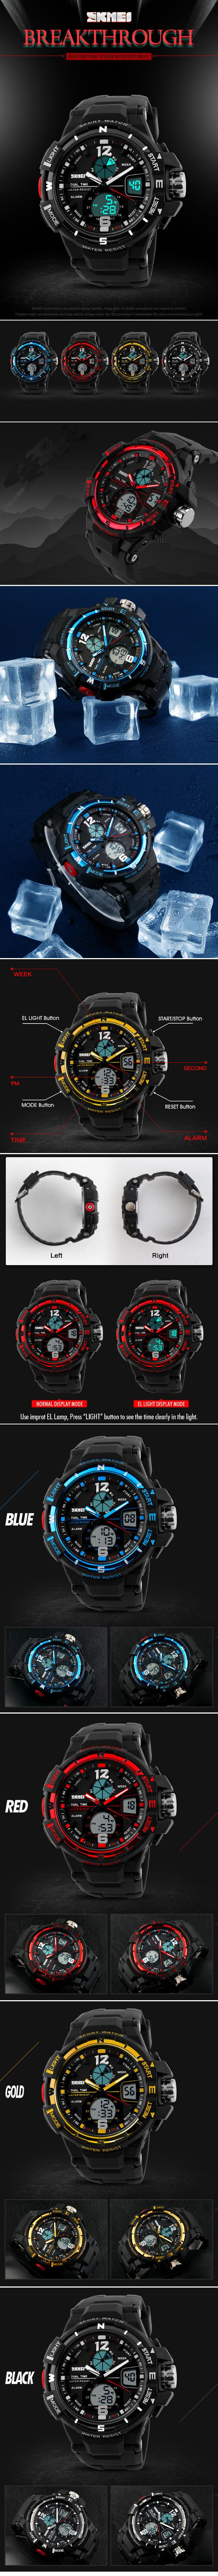 skmei 1148 analog digital dual time chronograph waterproof men skmei 1148 analog digital dual time chronograph waterproof men sport watch at banggood